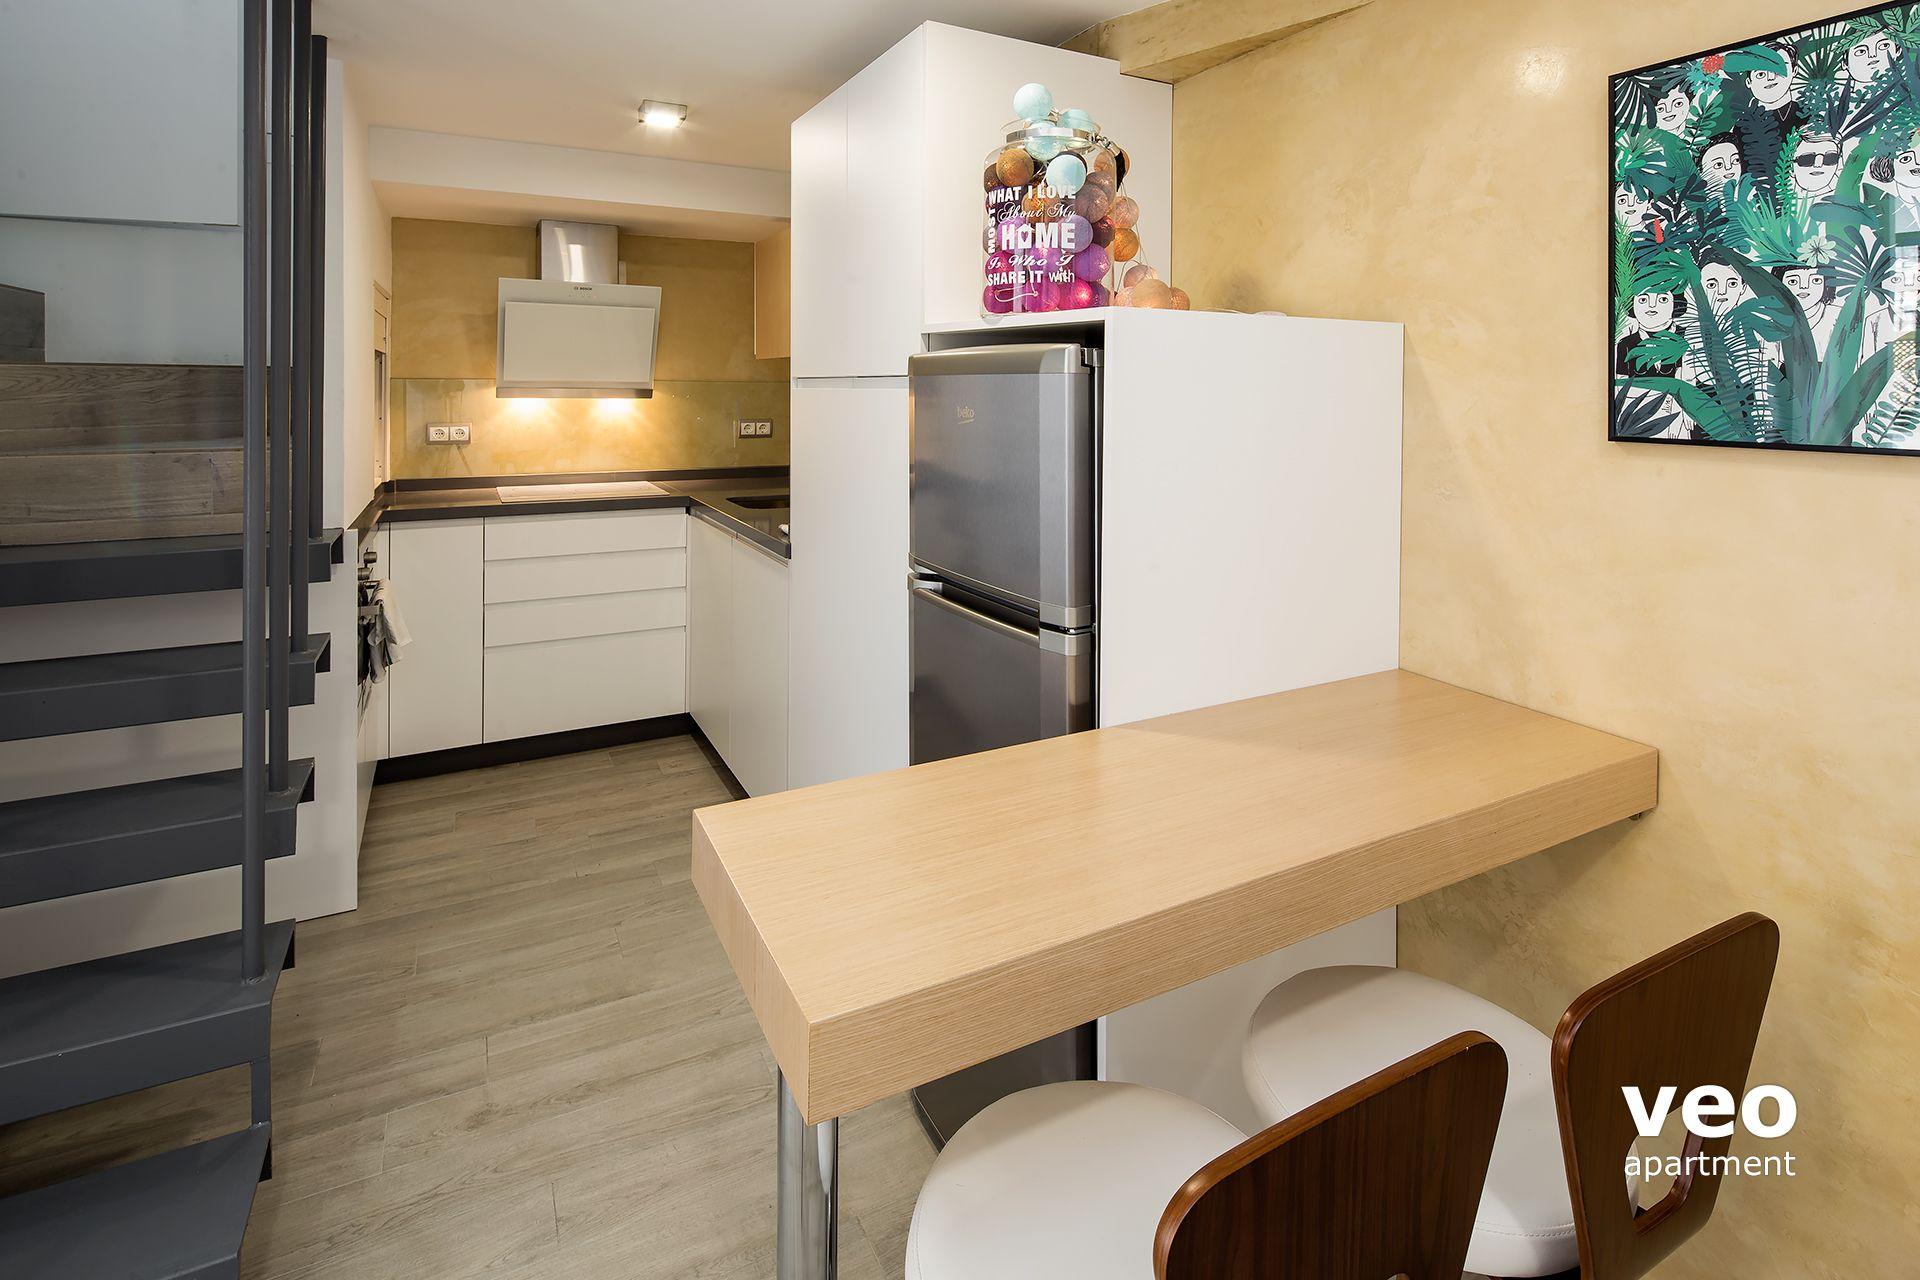 Appartement Rue Escoberos S 233 Ville Espagne Escoberos